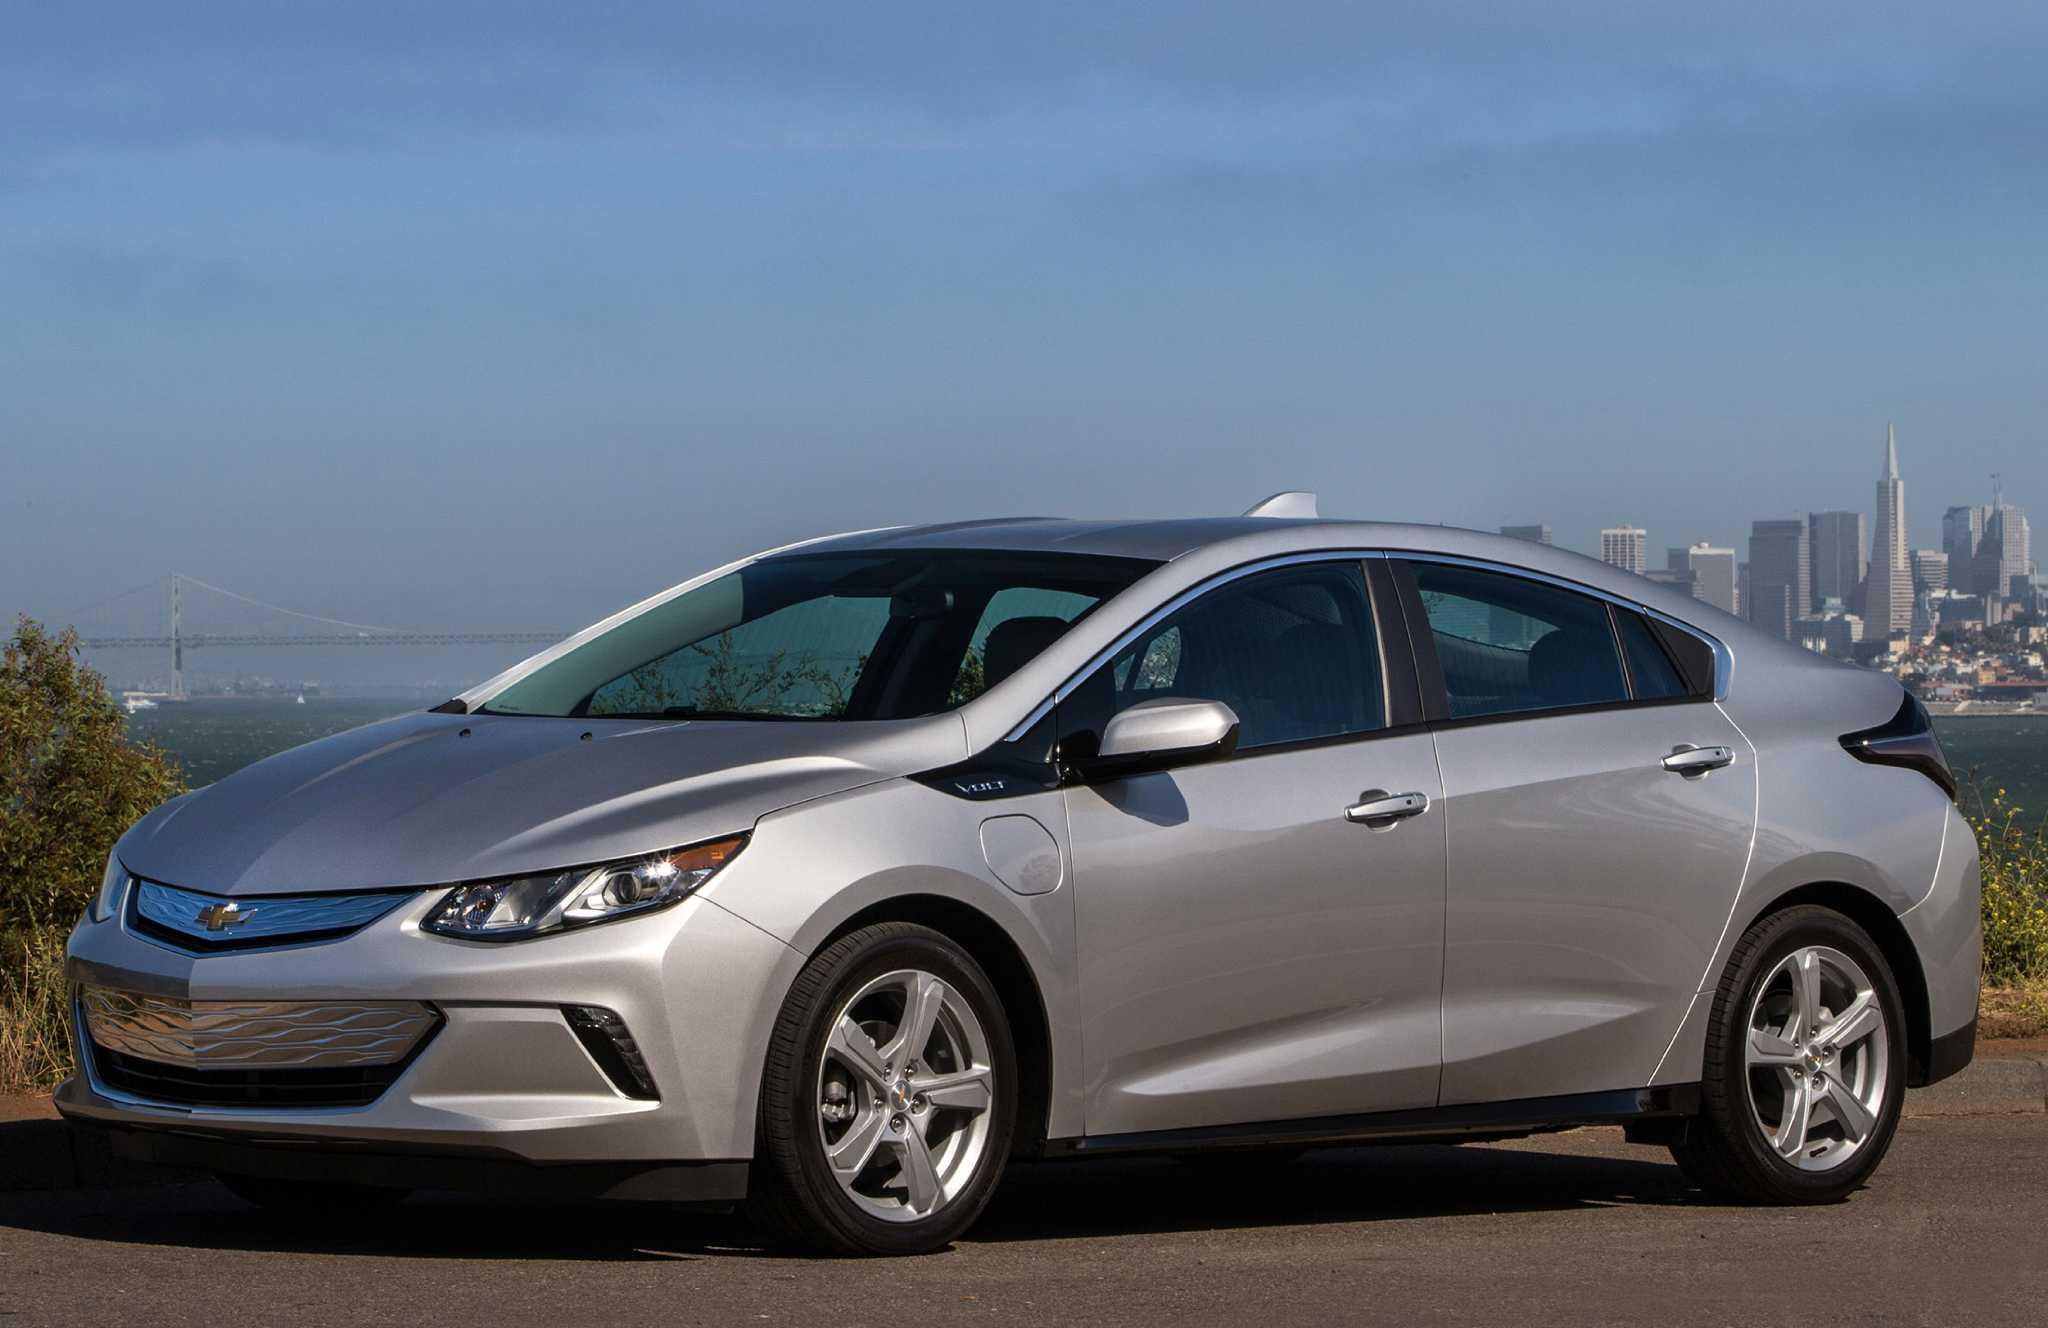 Redesigned Chevrolet Volt plug-in hybrid has extended EV range